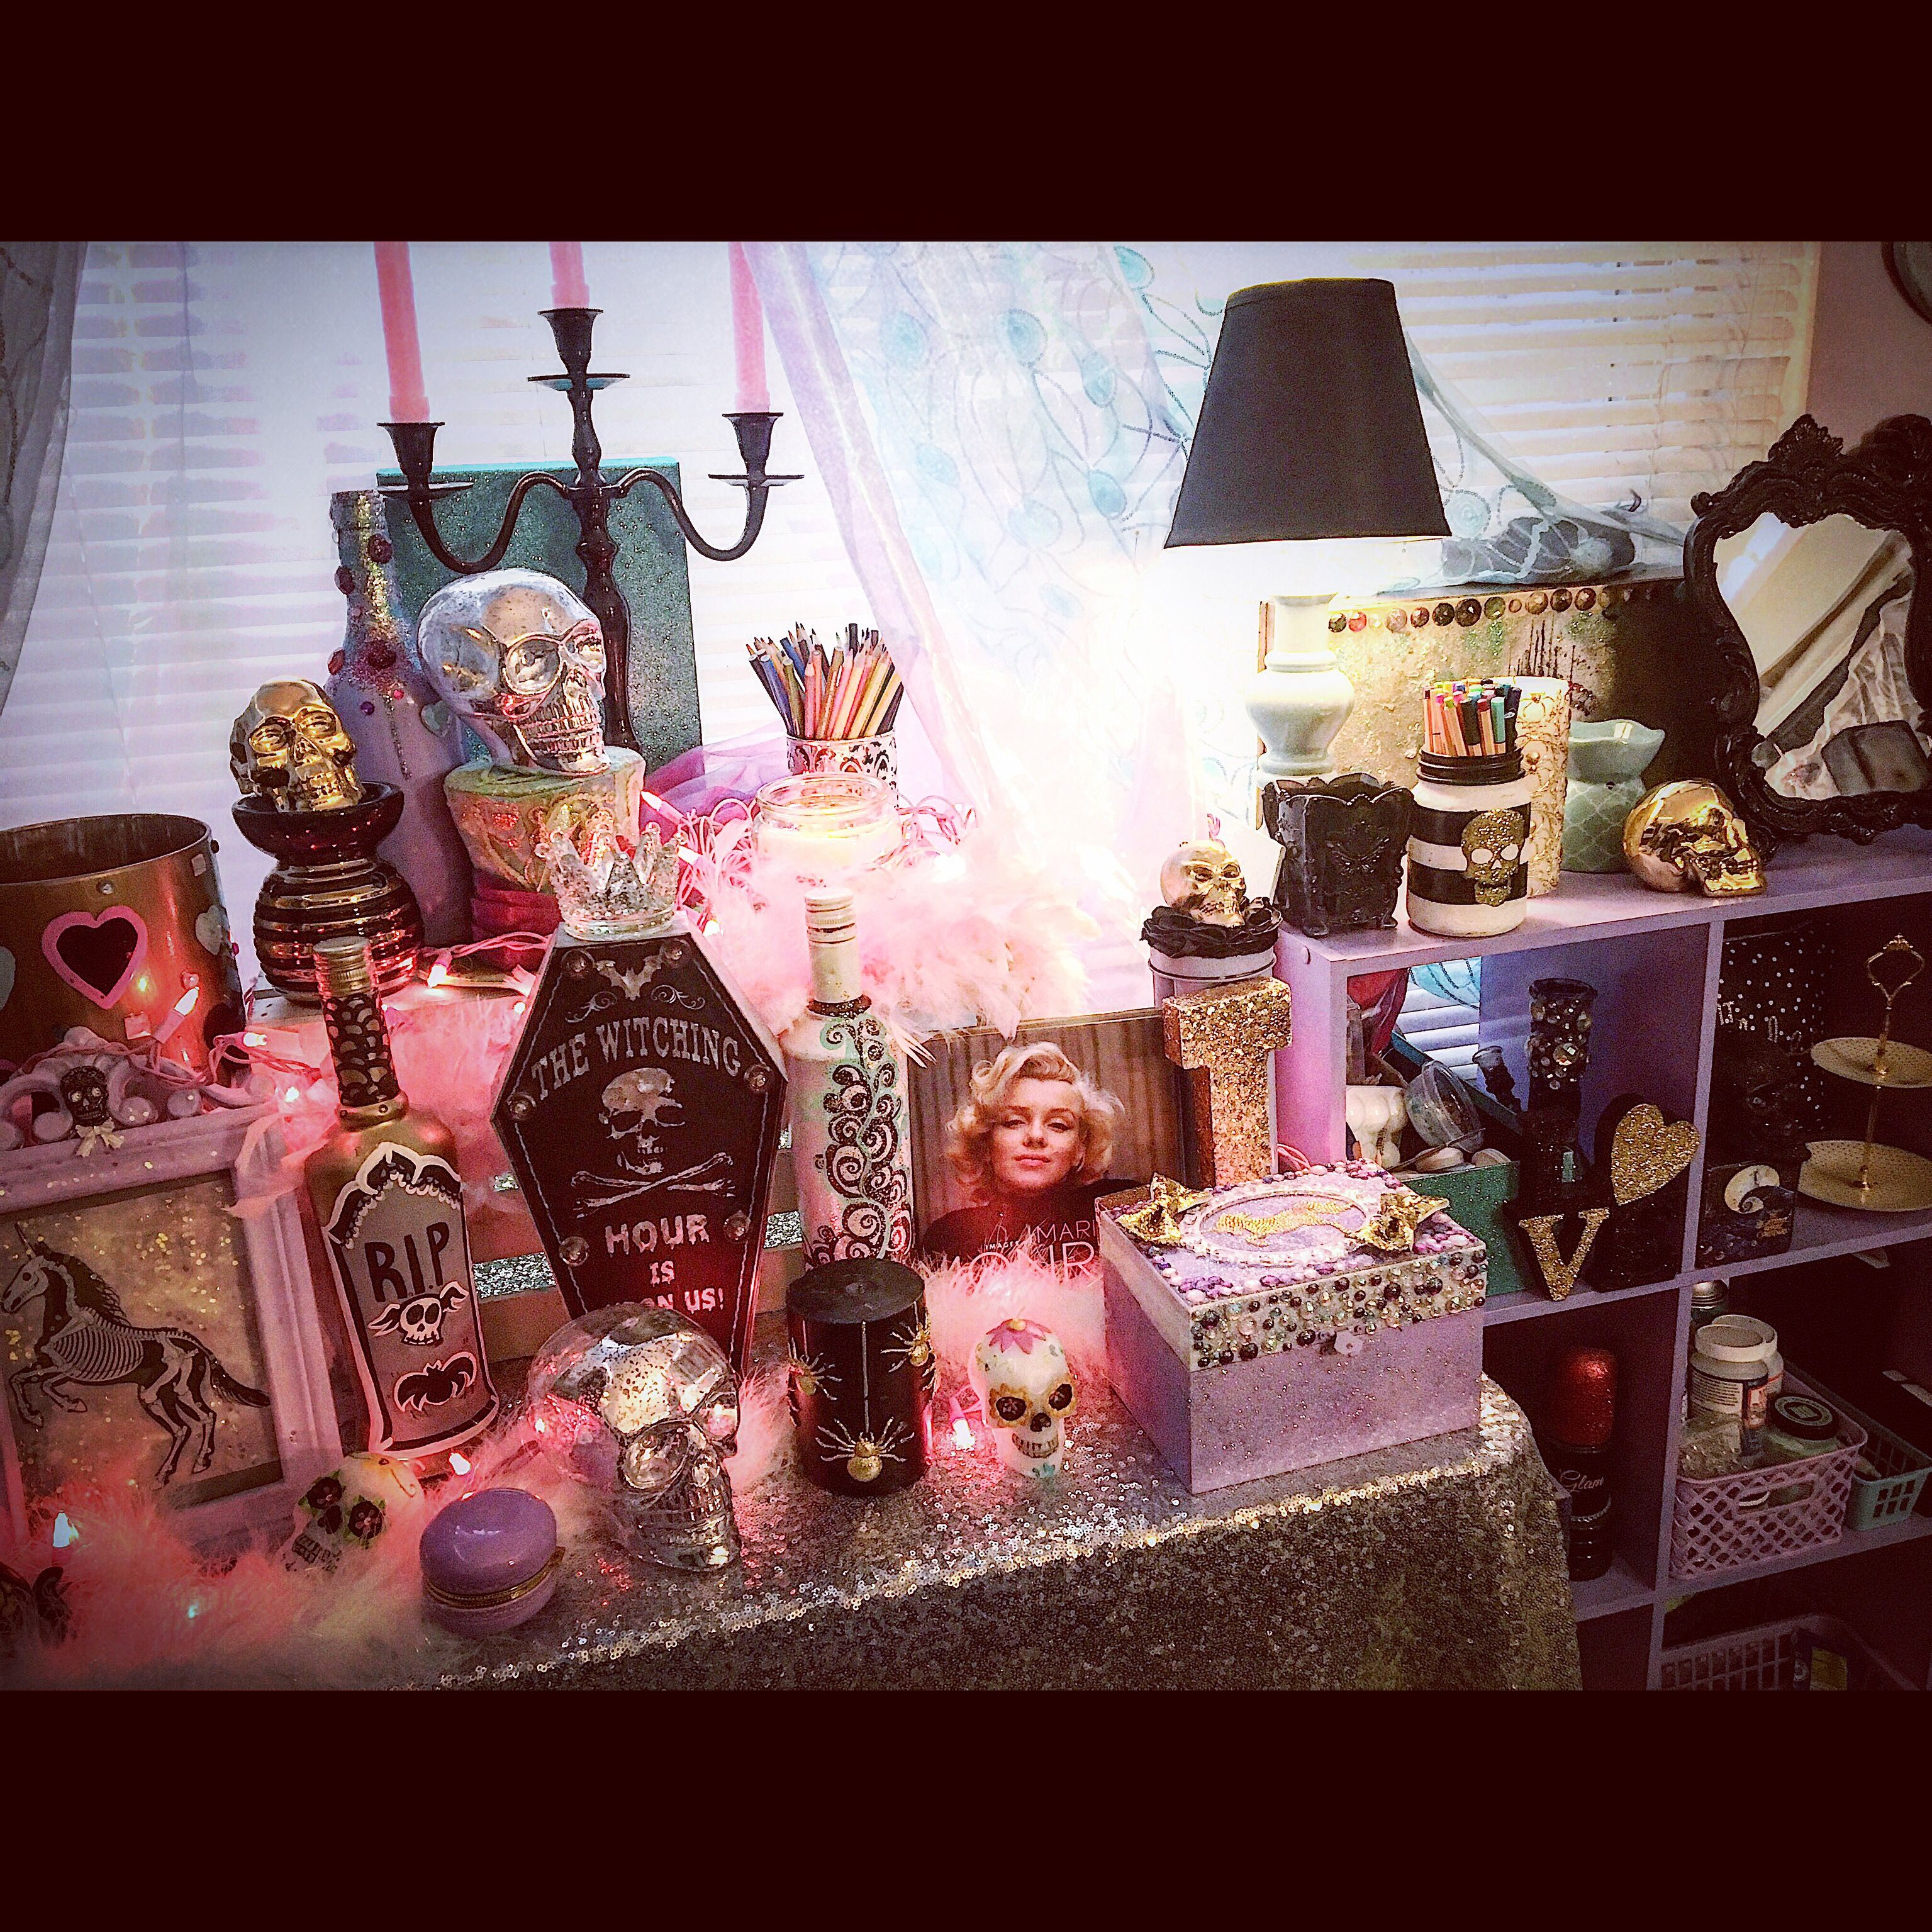 My Pastel Goth Makeup Room Decor Jaidyn Perkins Goth Bedroom Decor Meditation Room Decor Pastel Goth Room